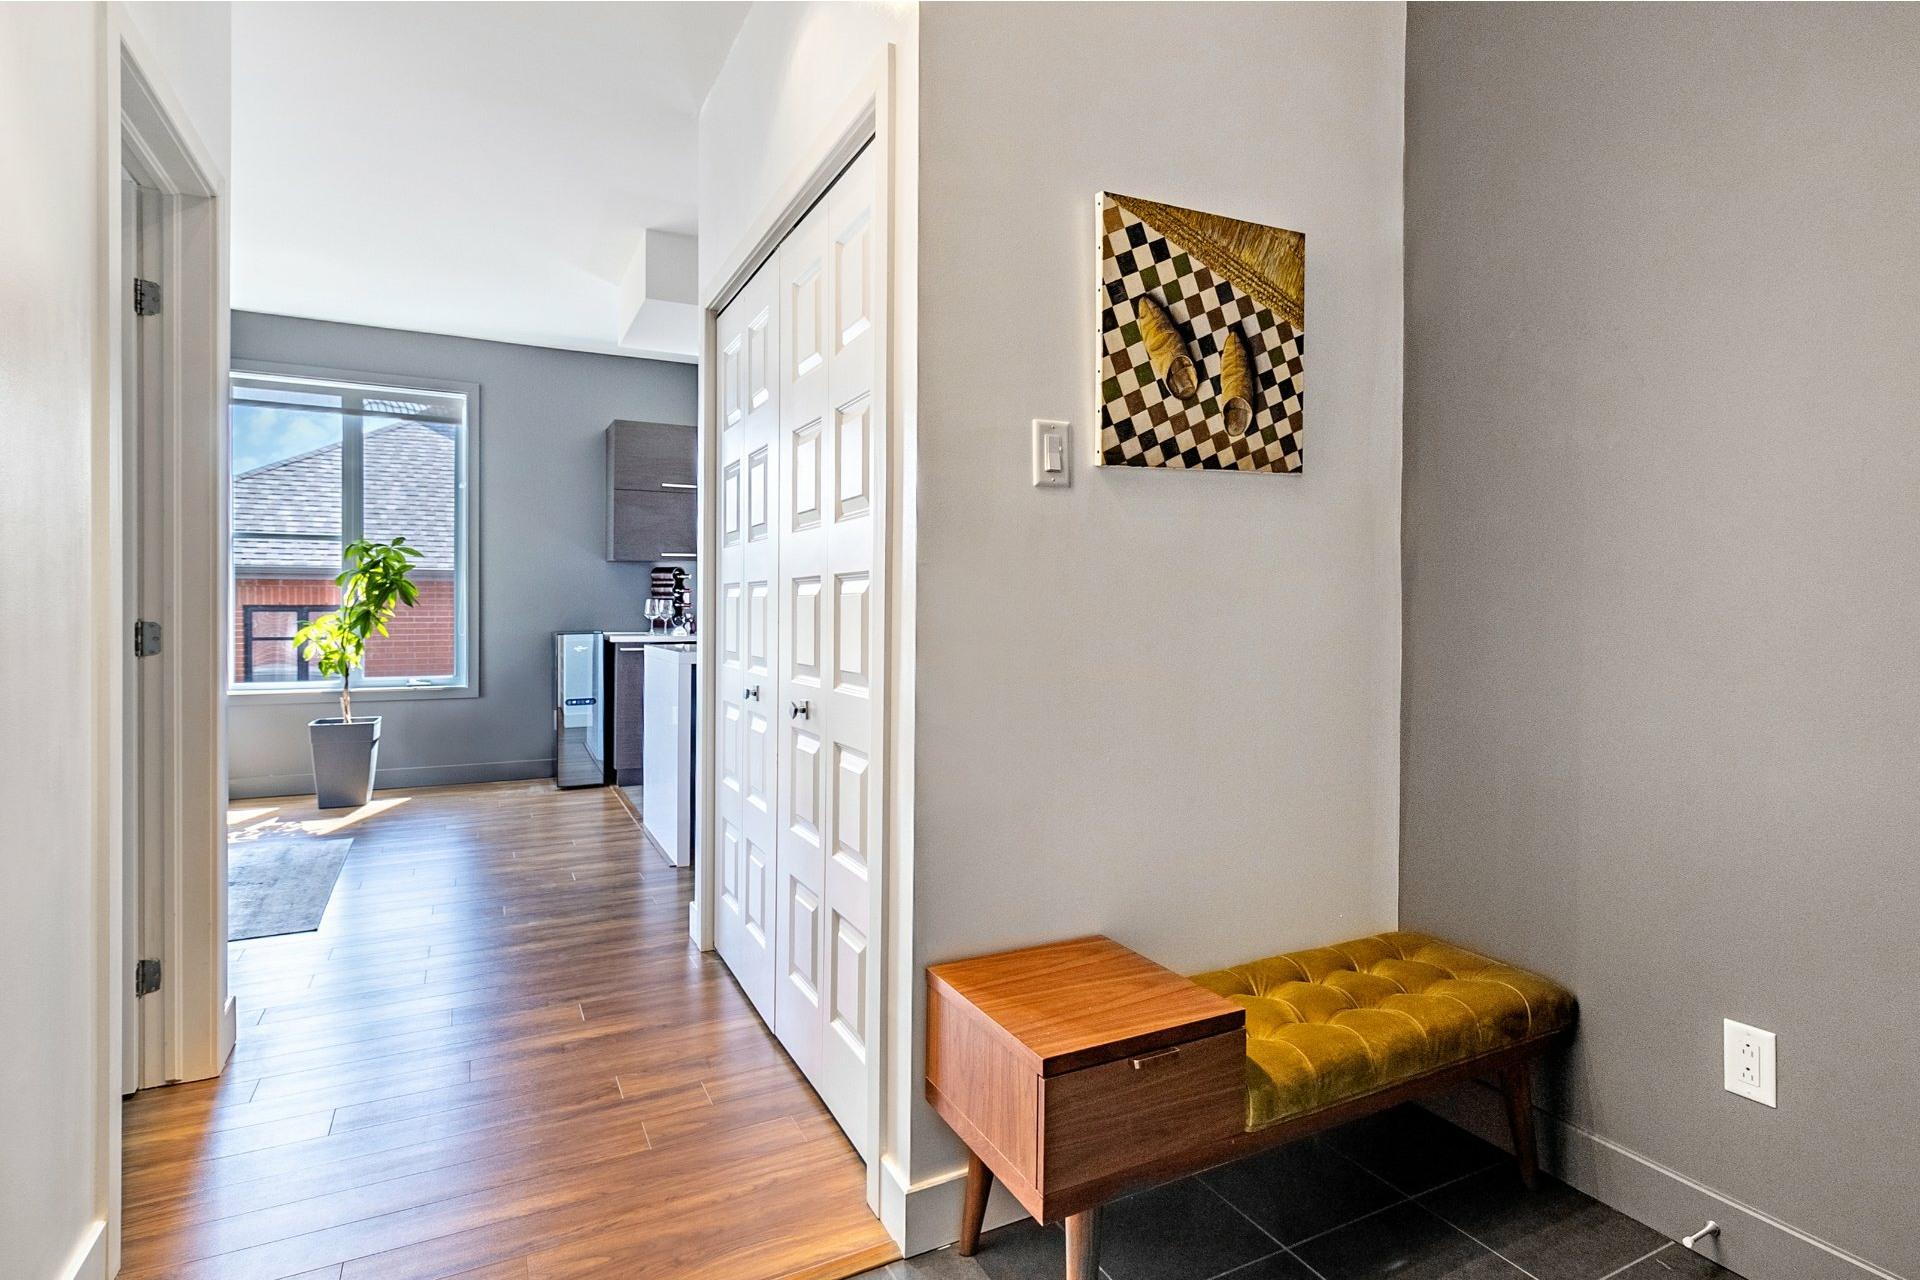 image 4 - Apartment For sale Saint-Hubert Longueuil  - 7 rooms